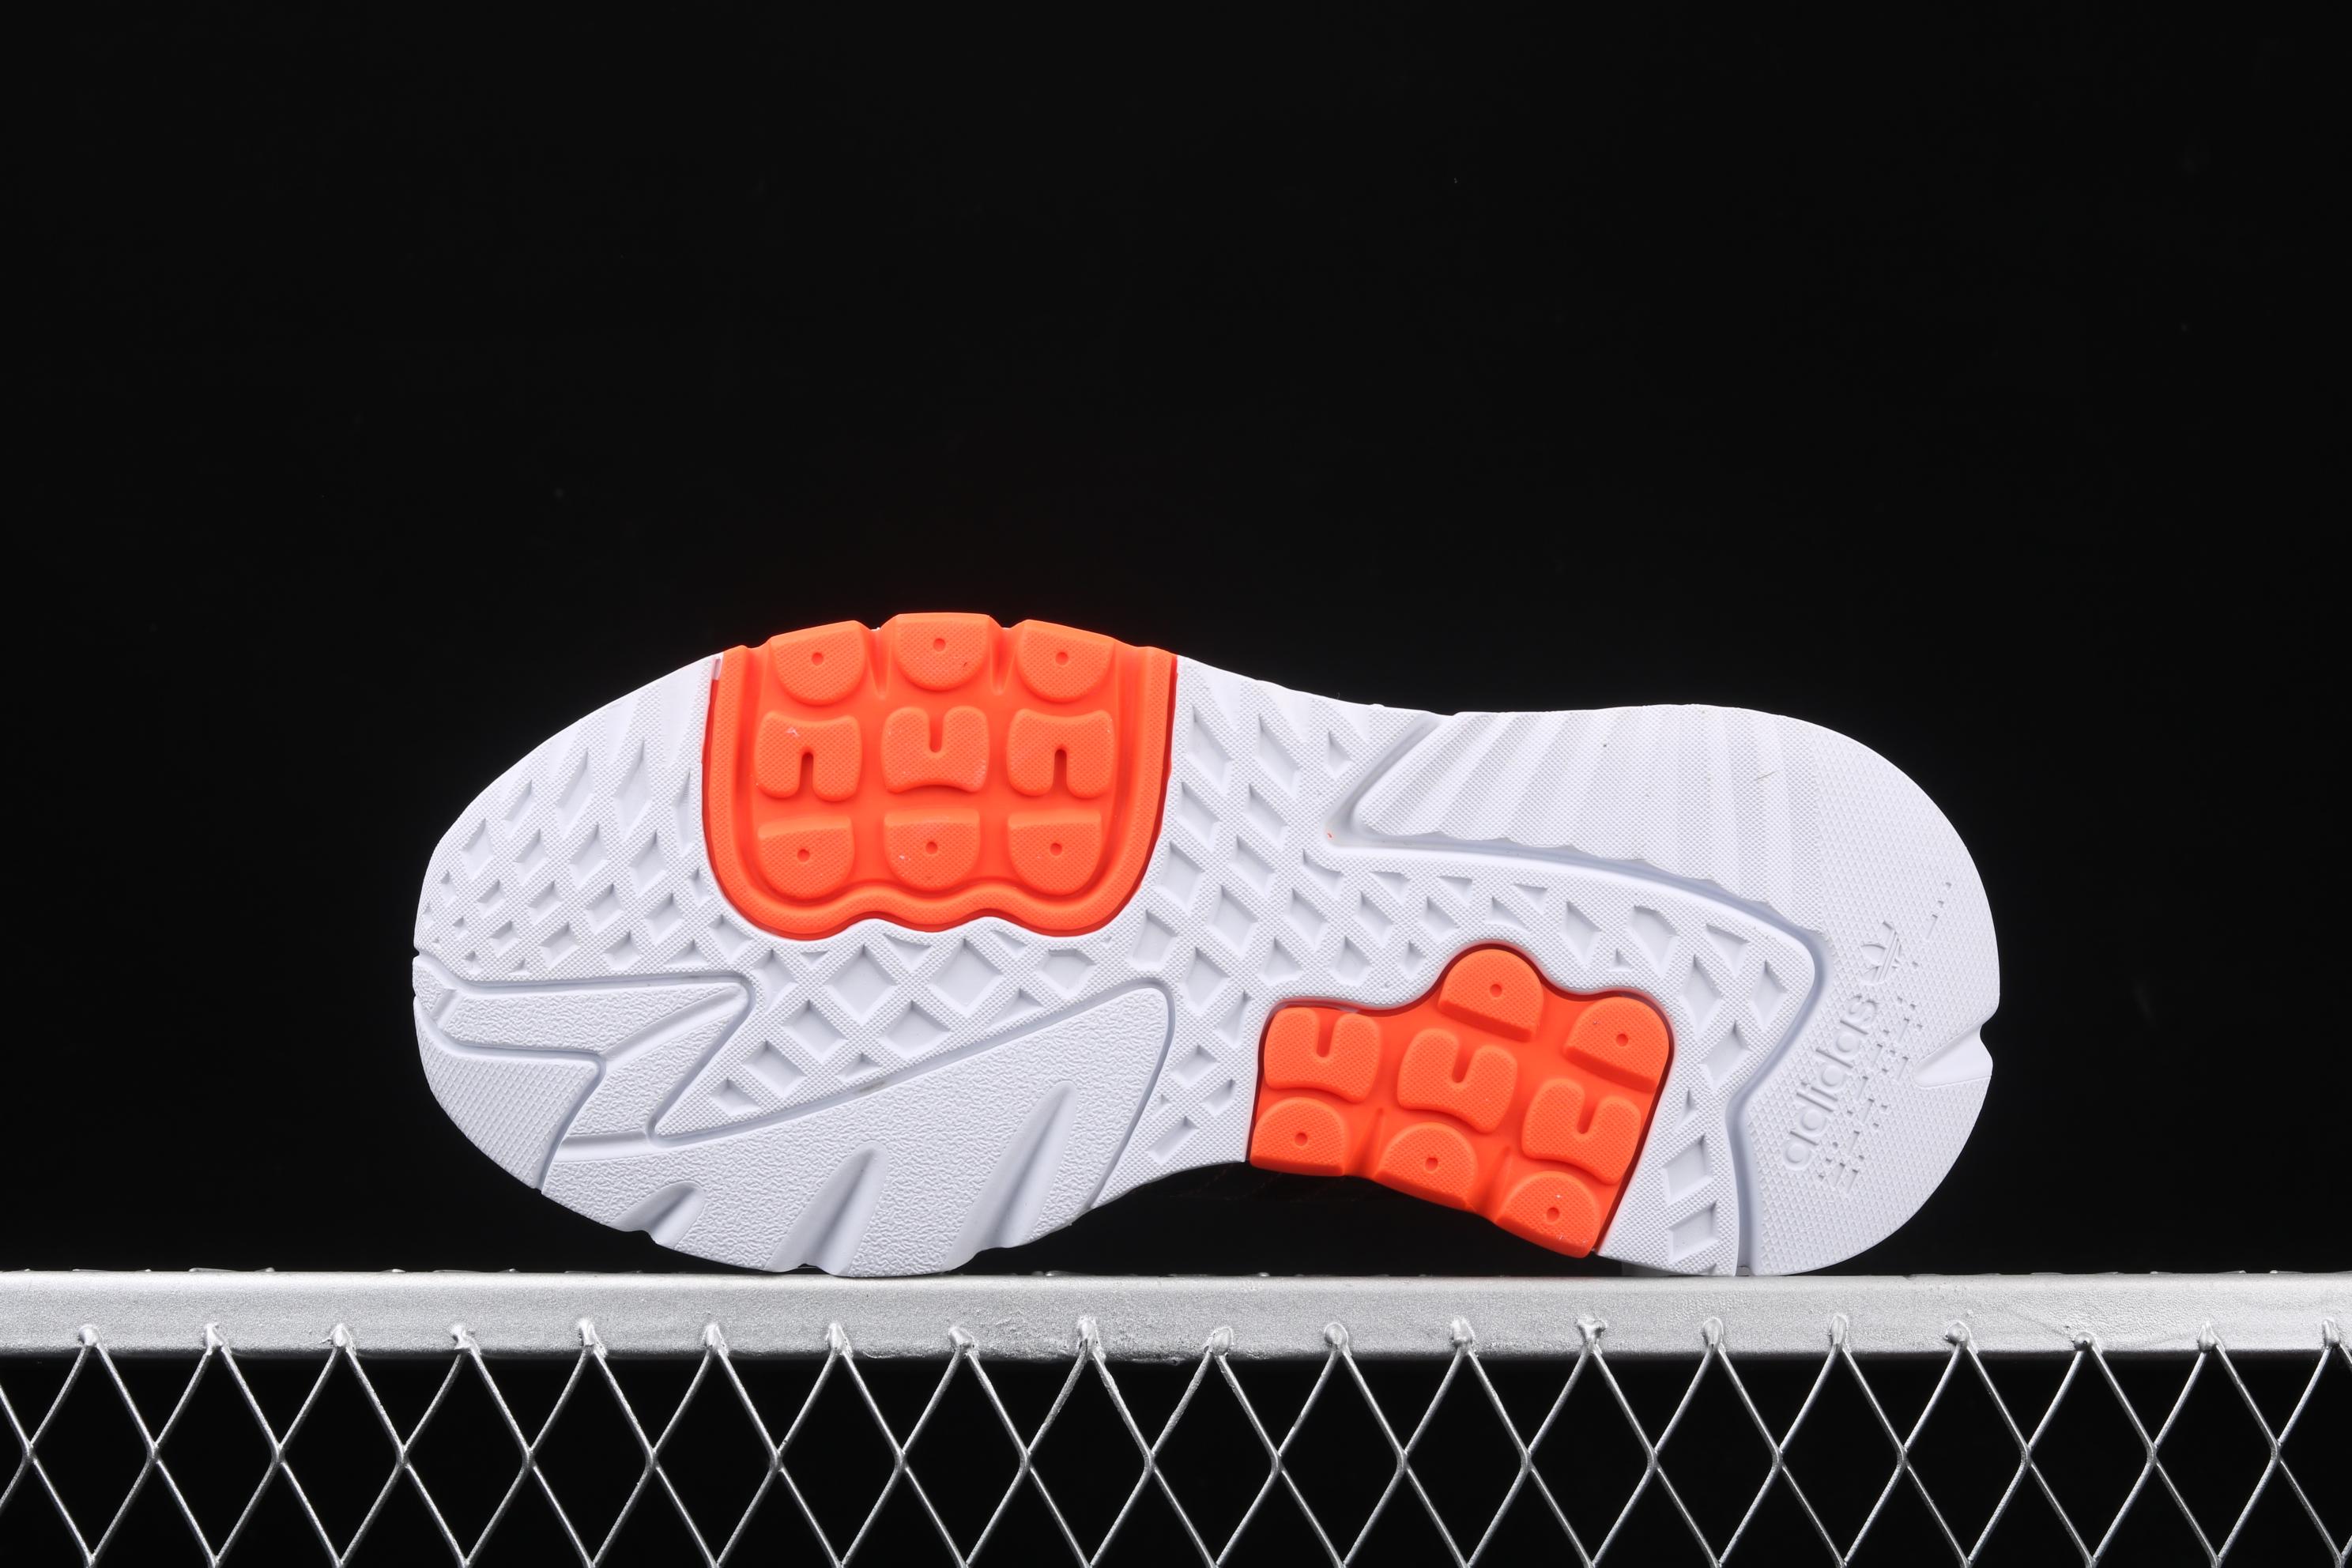 Ad Nite Jogger 2019 Boost FU6842 3M反光复古跑鞋